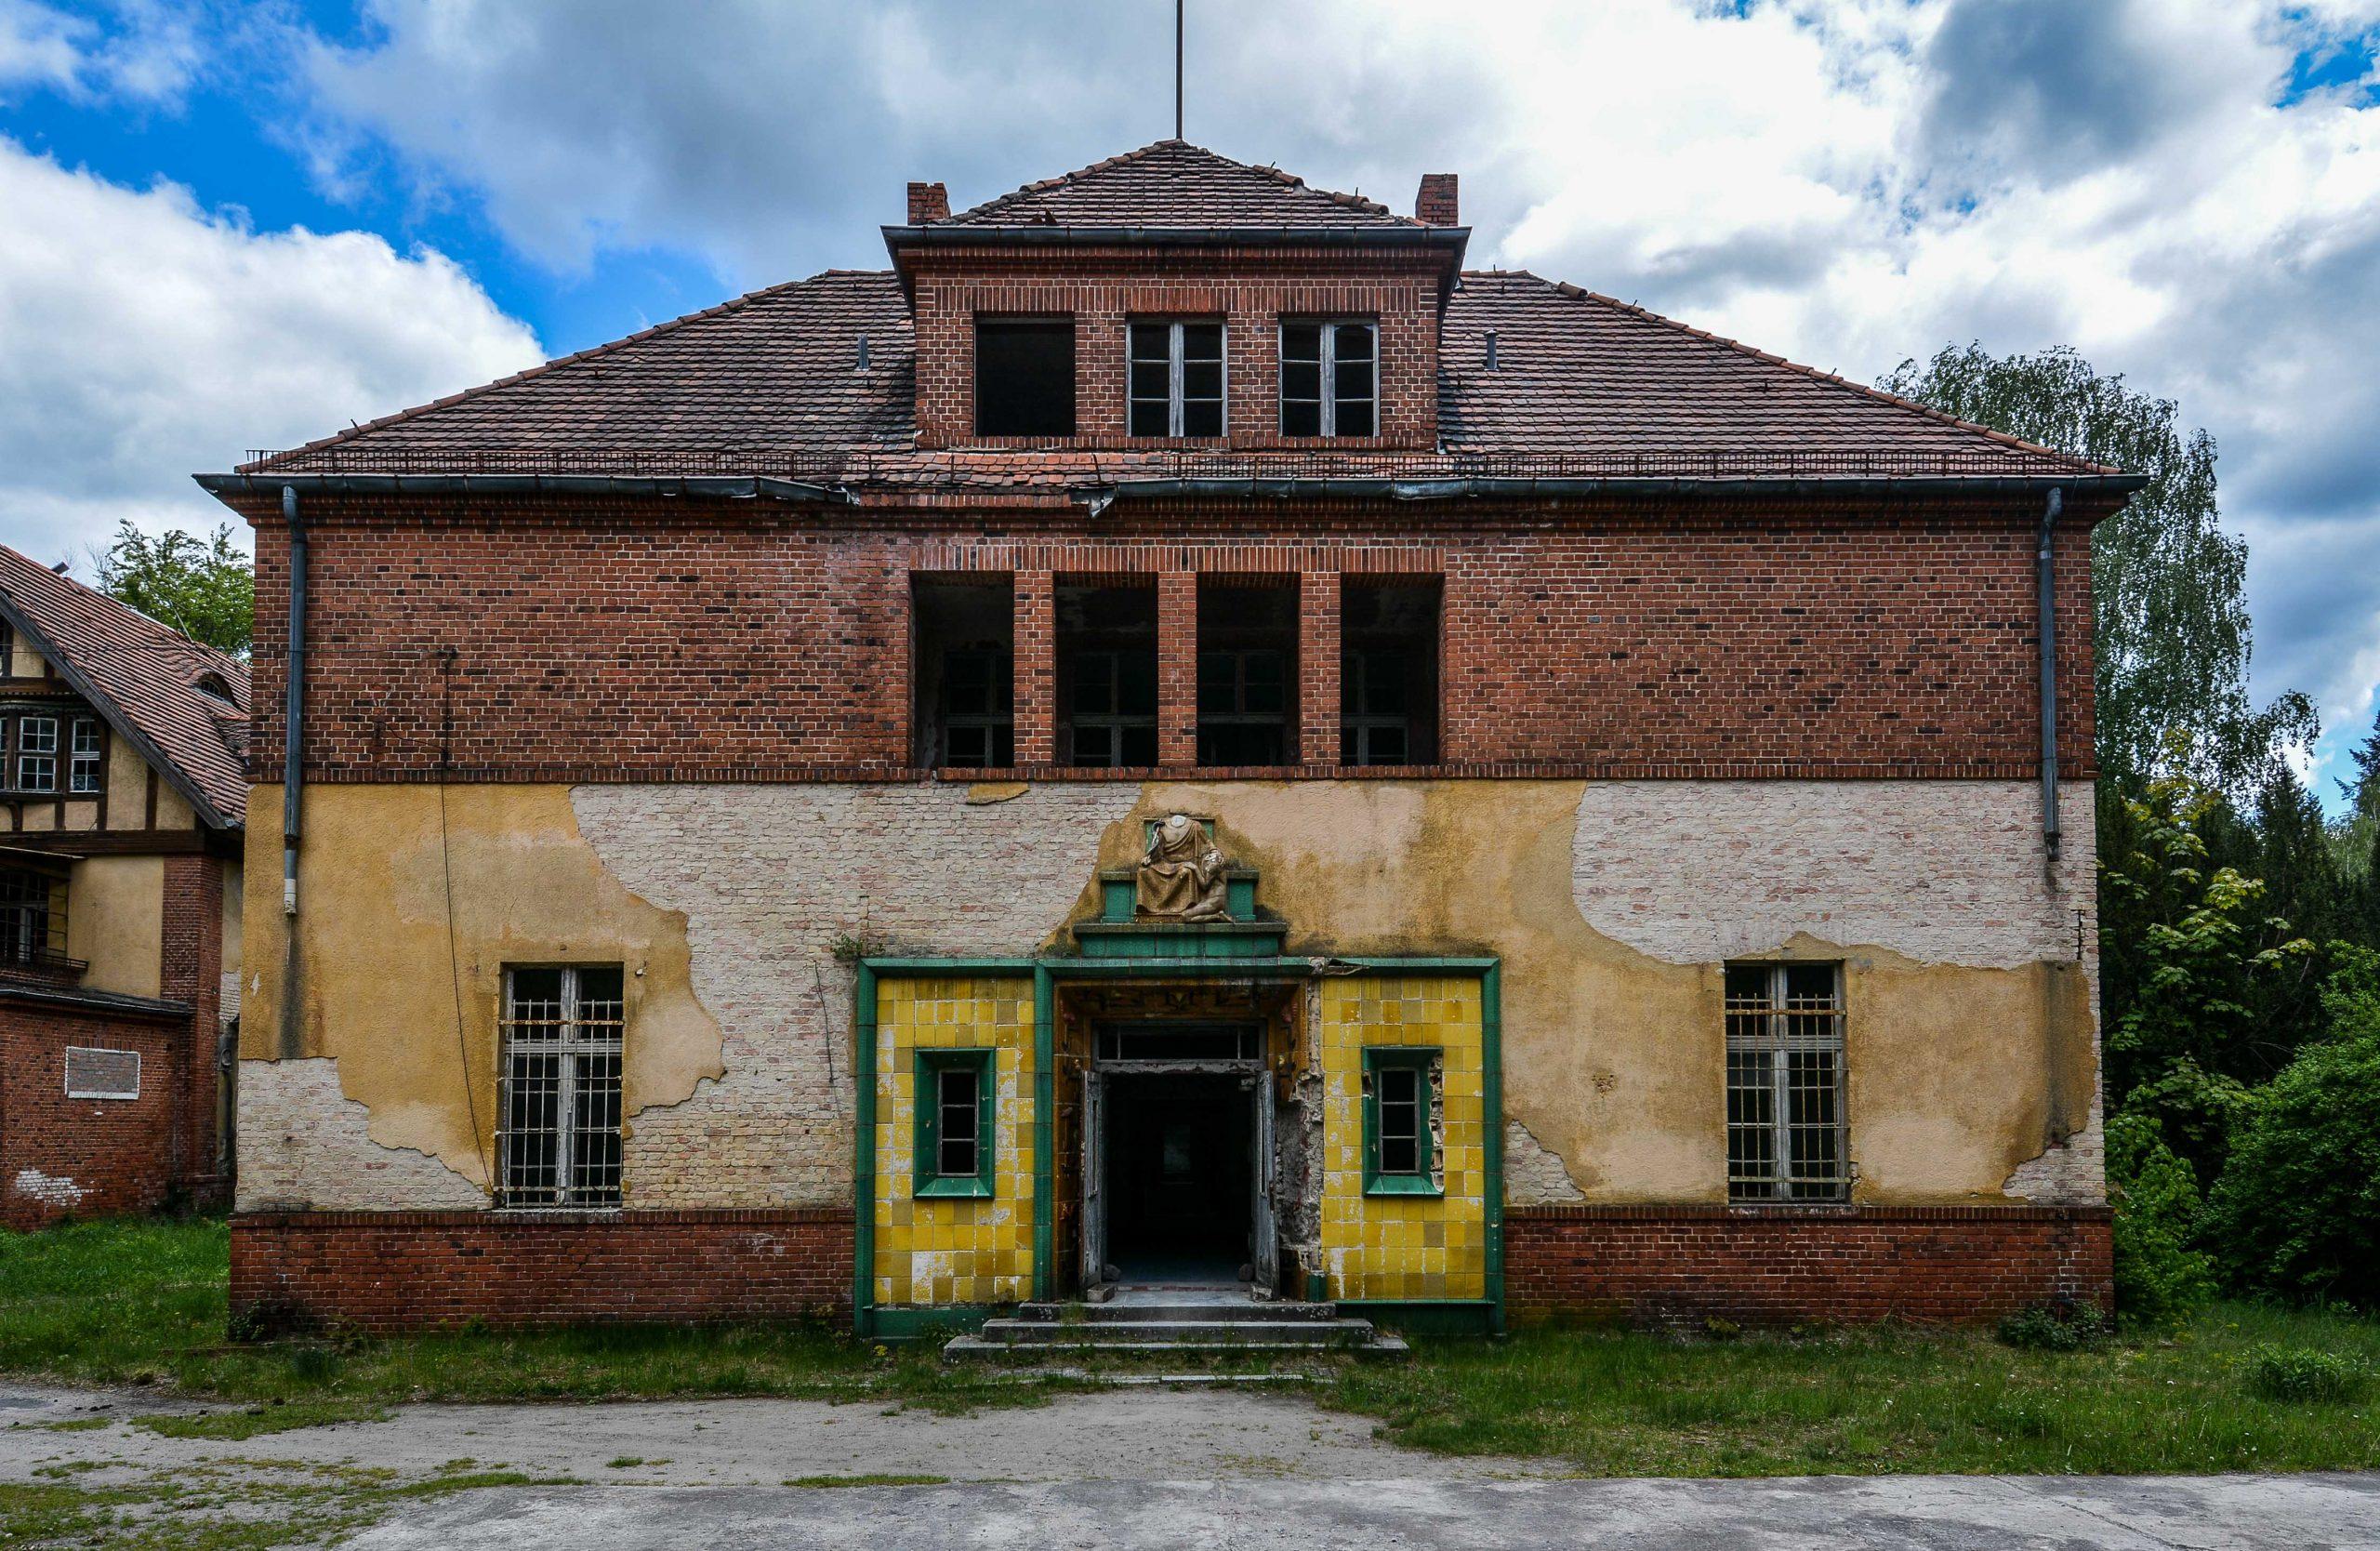 grand side entrance tiles tuberkulose heilstaette grabowsee sanatorium hospital oranienburg lost places abandoned urbex brandenburg germany deutschland